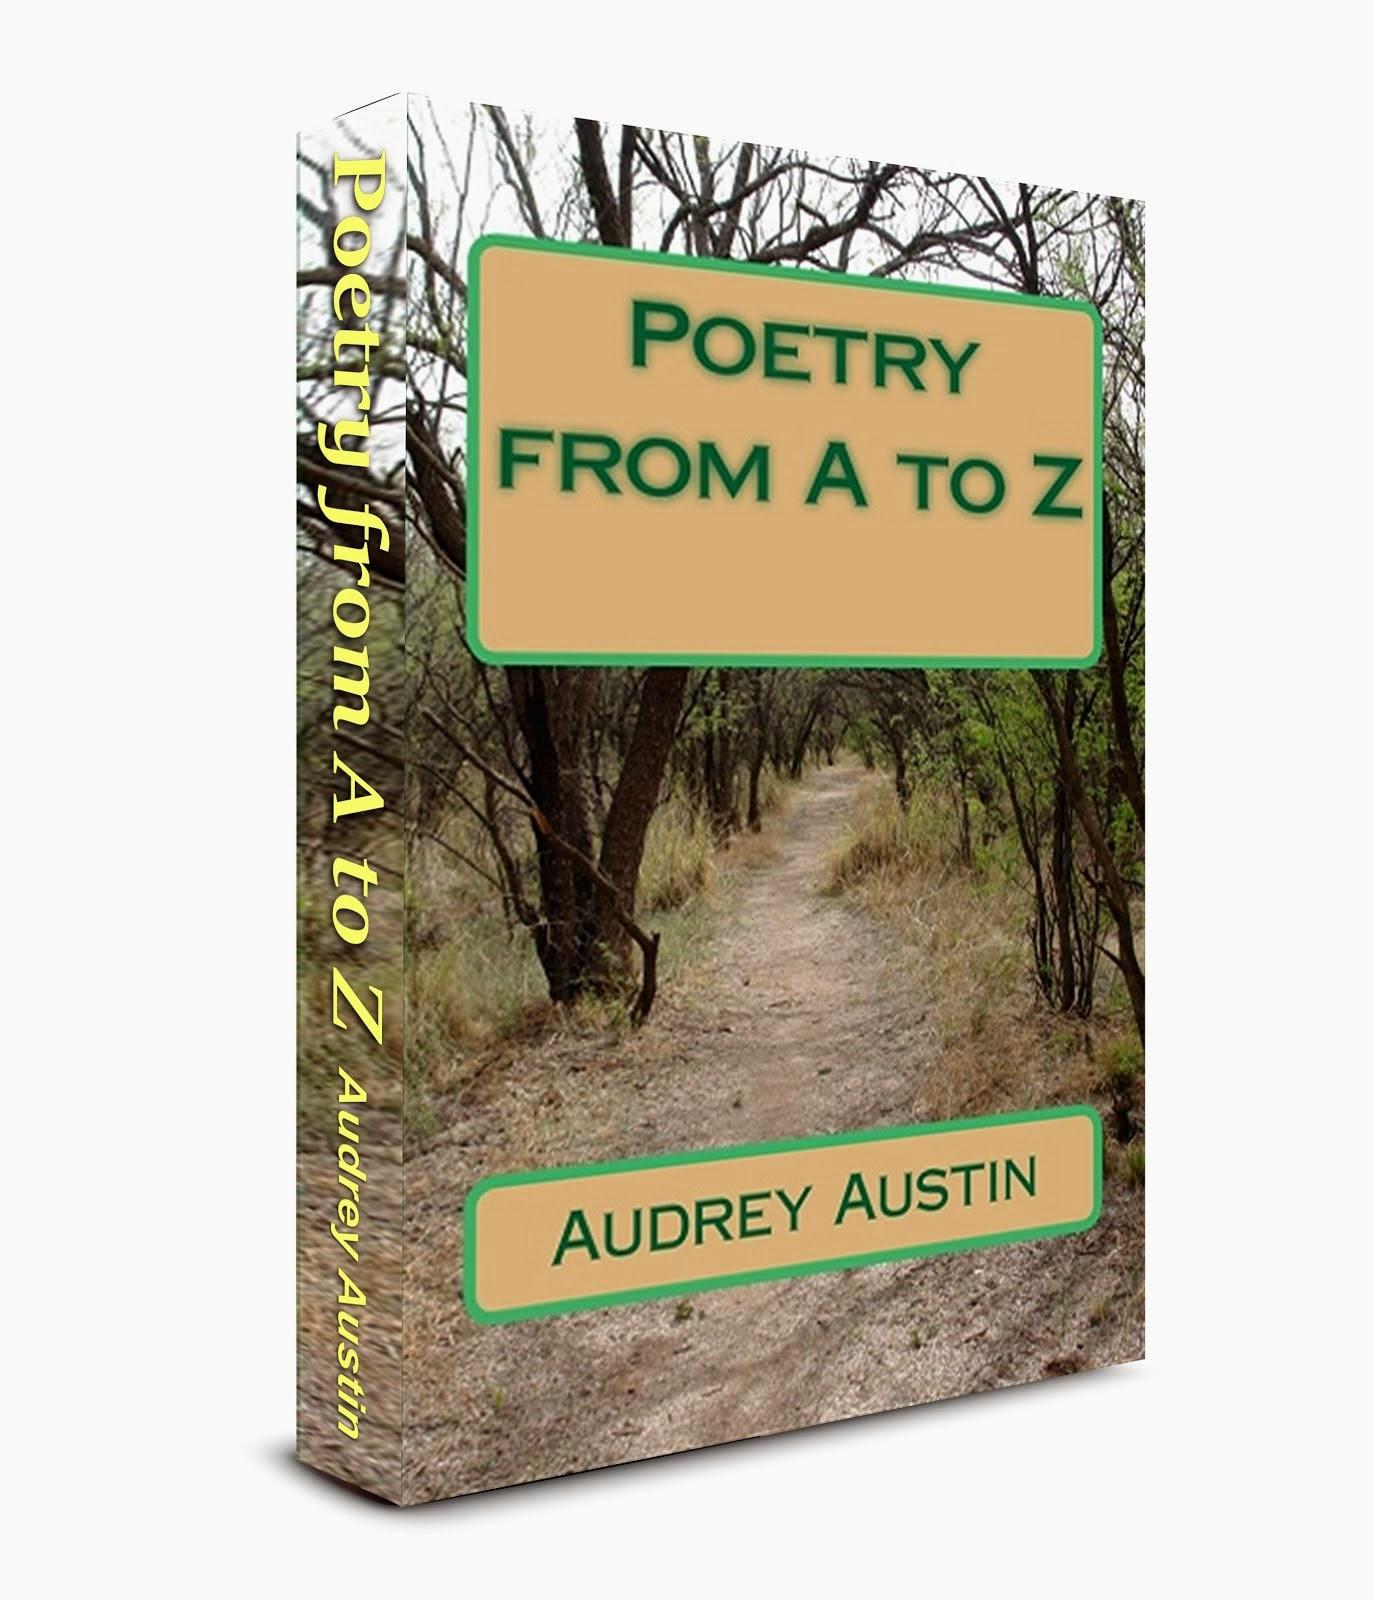 Poet, Audrey Austin